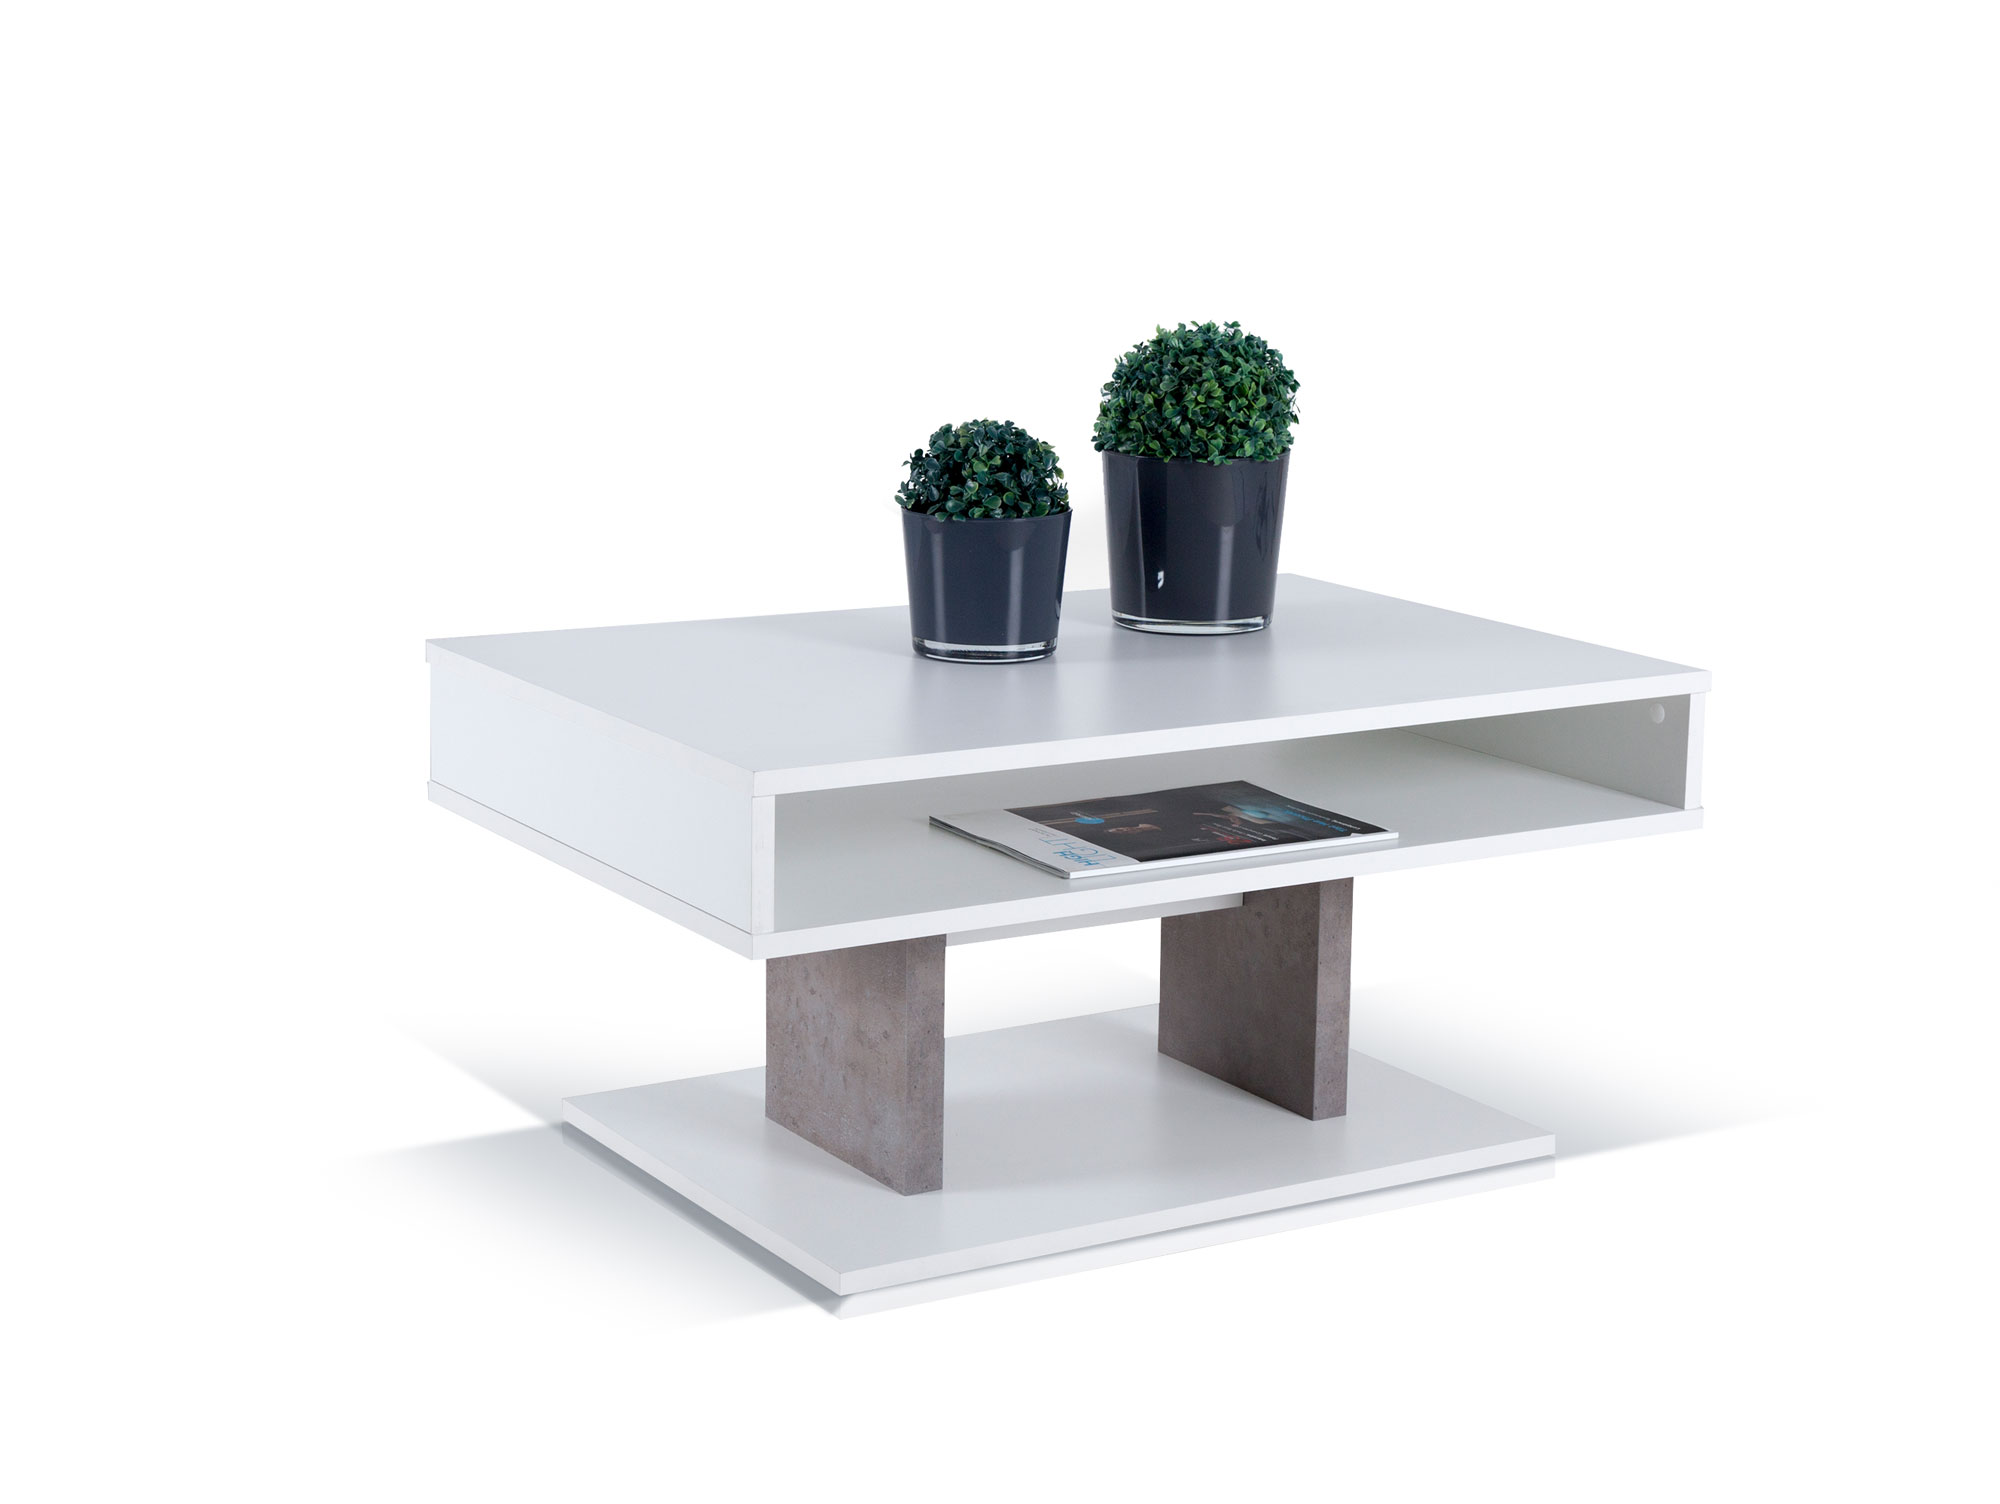 pisa couchtisch weiss matt beton. Black Bedroom Furniture Sets. Home Design Ideas